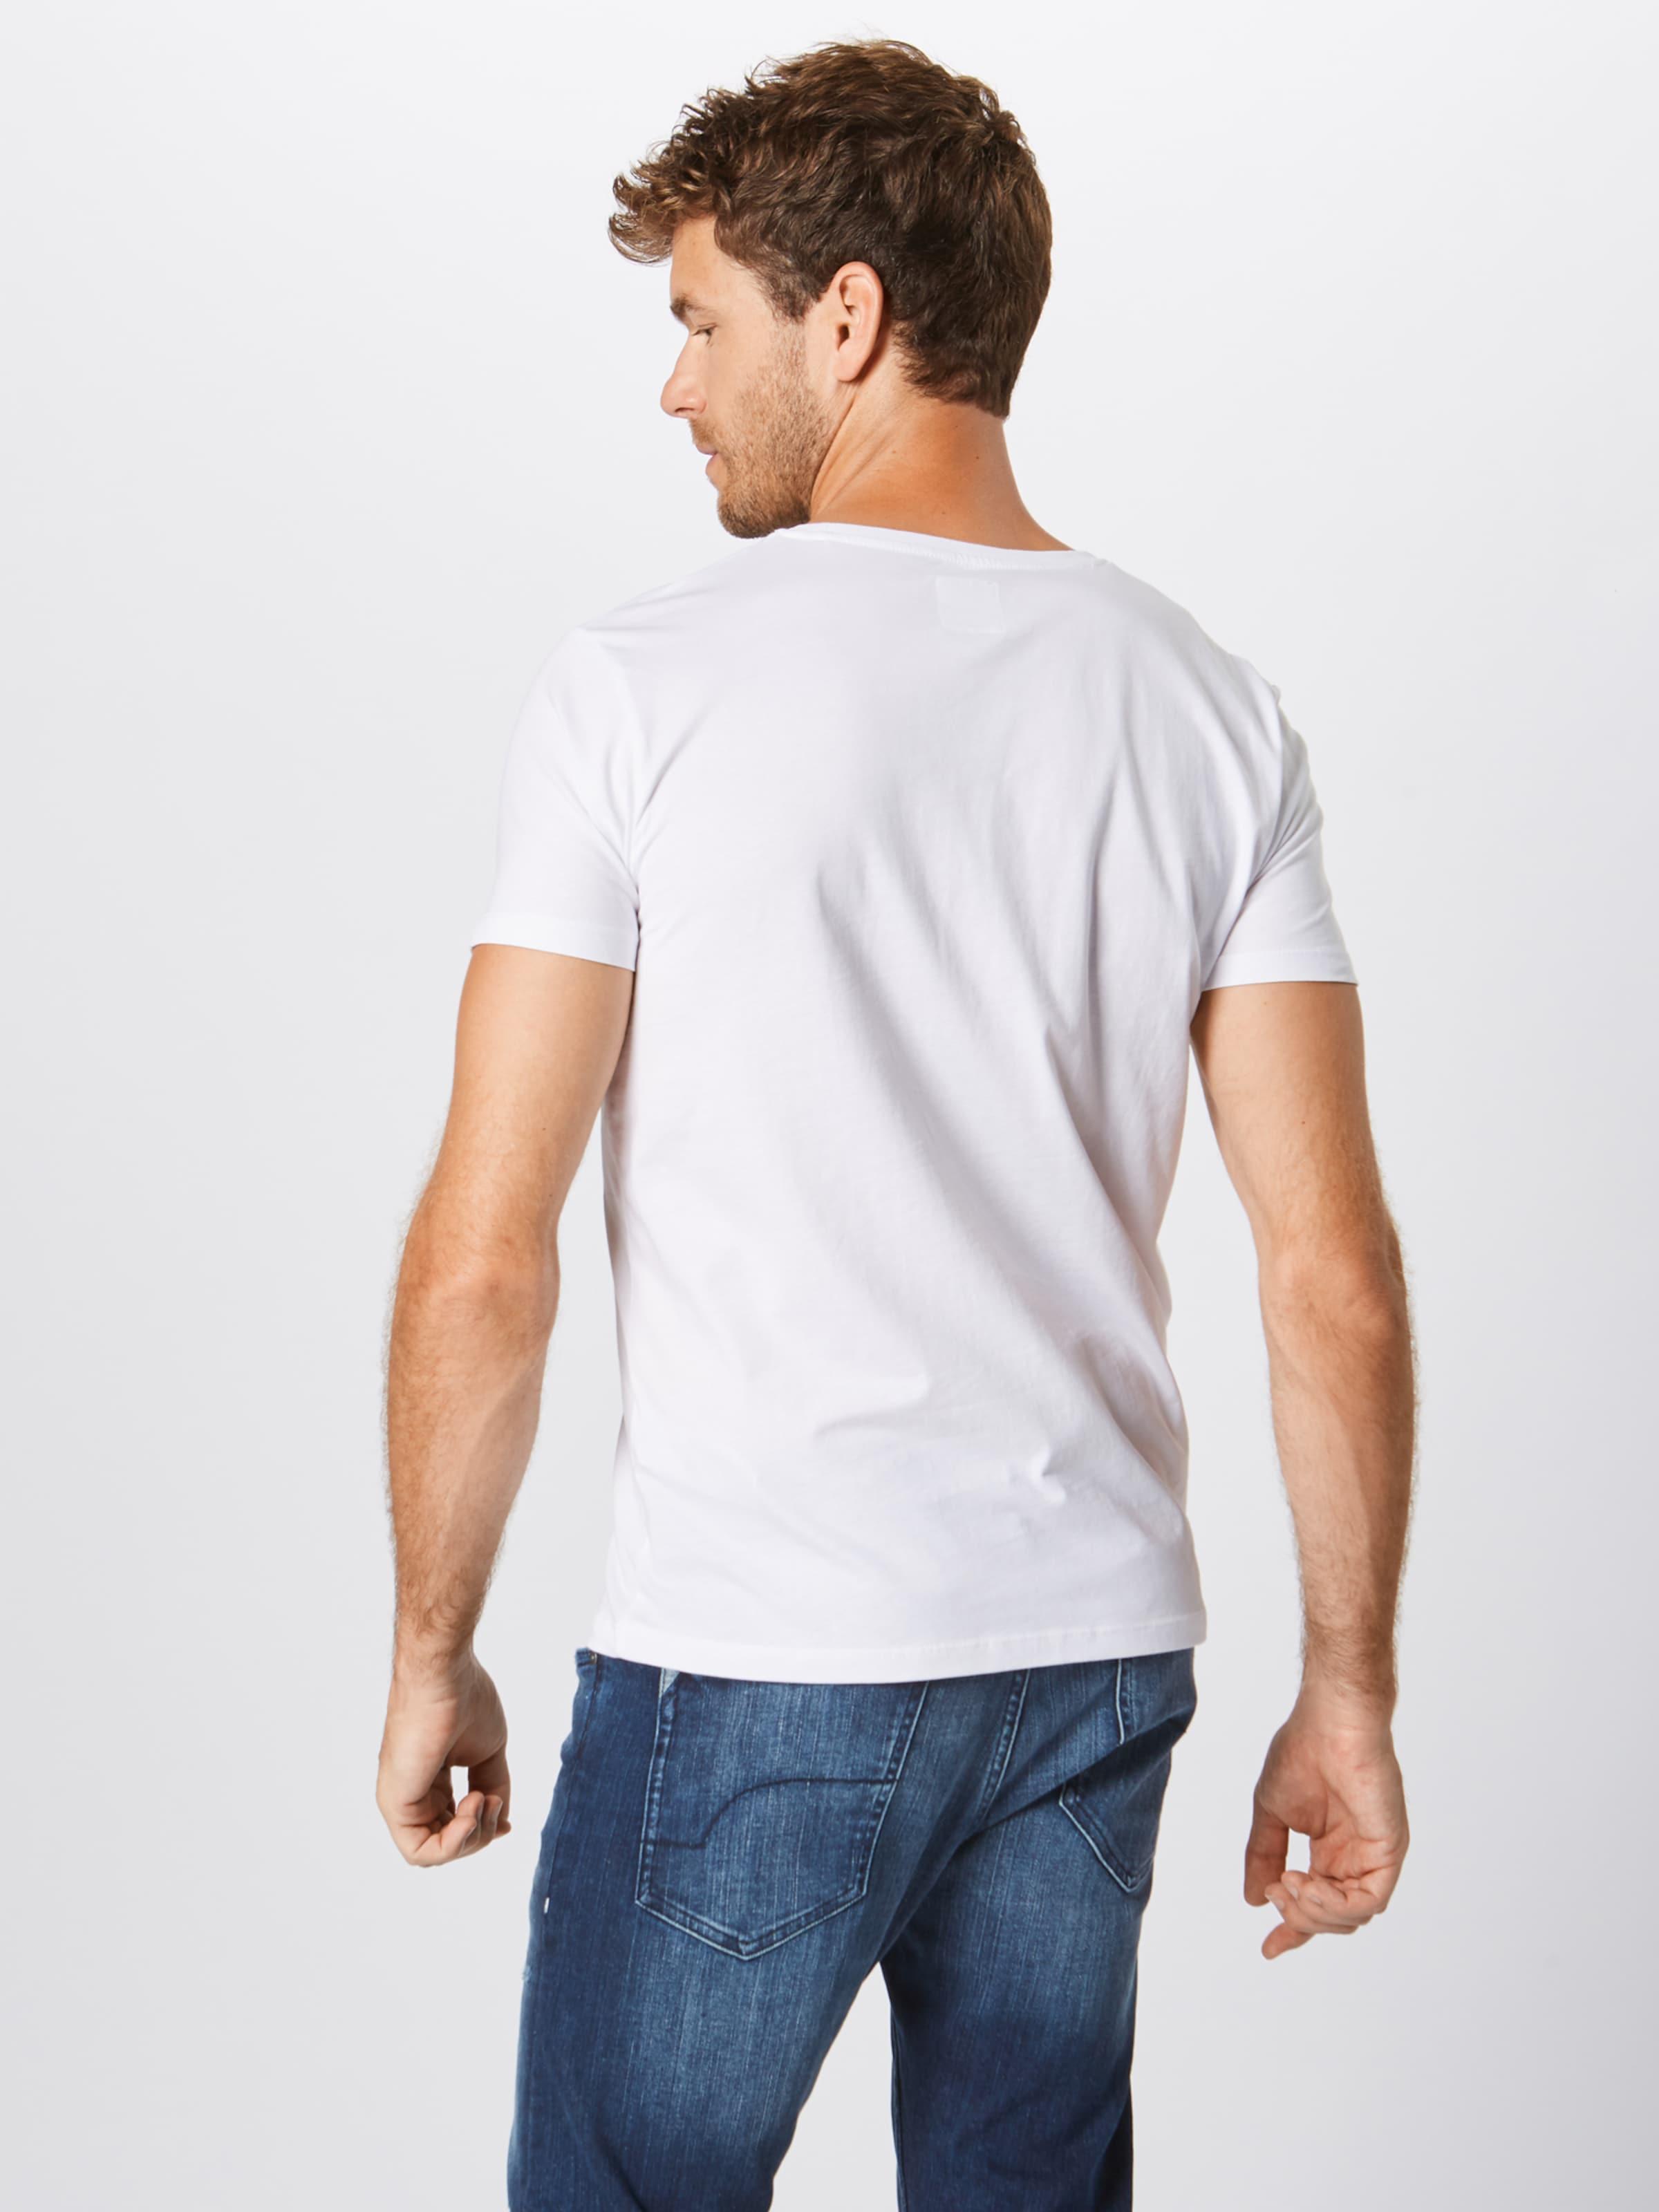 En shirt Edc Esprit T Blanc By jLUpGVSqzM